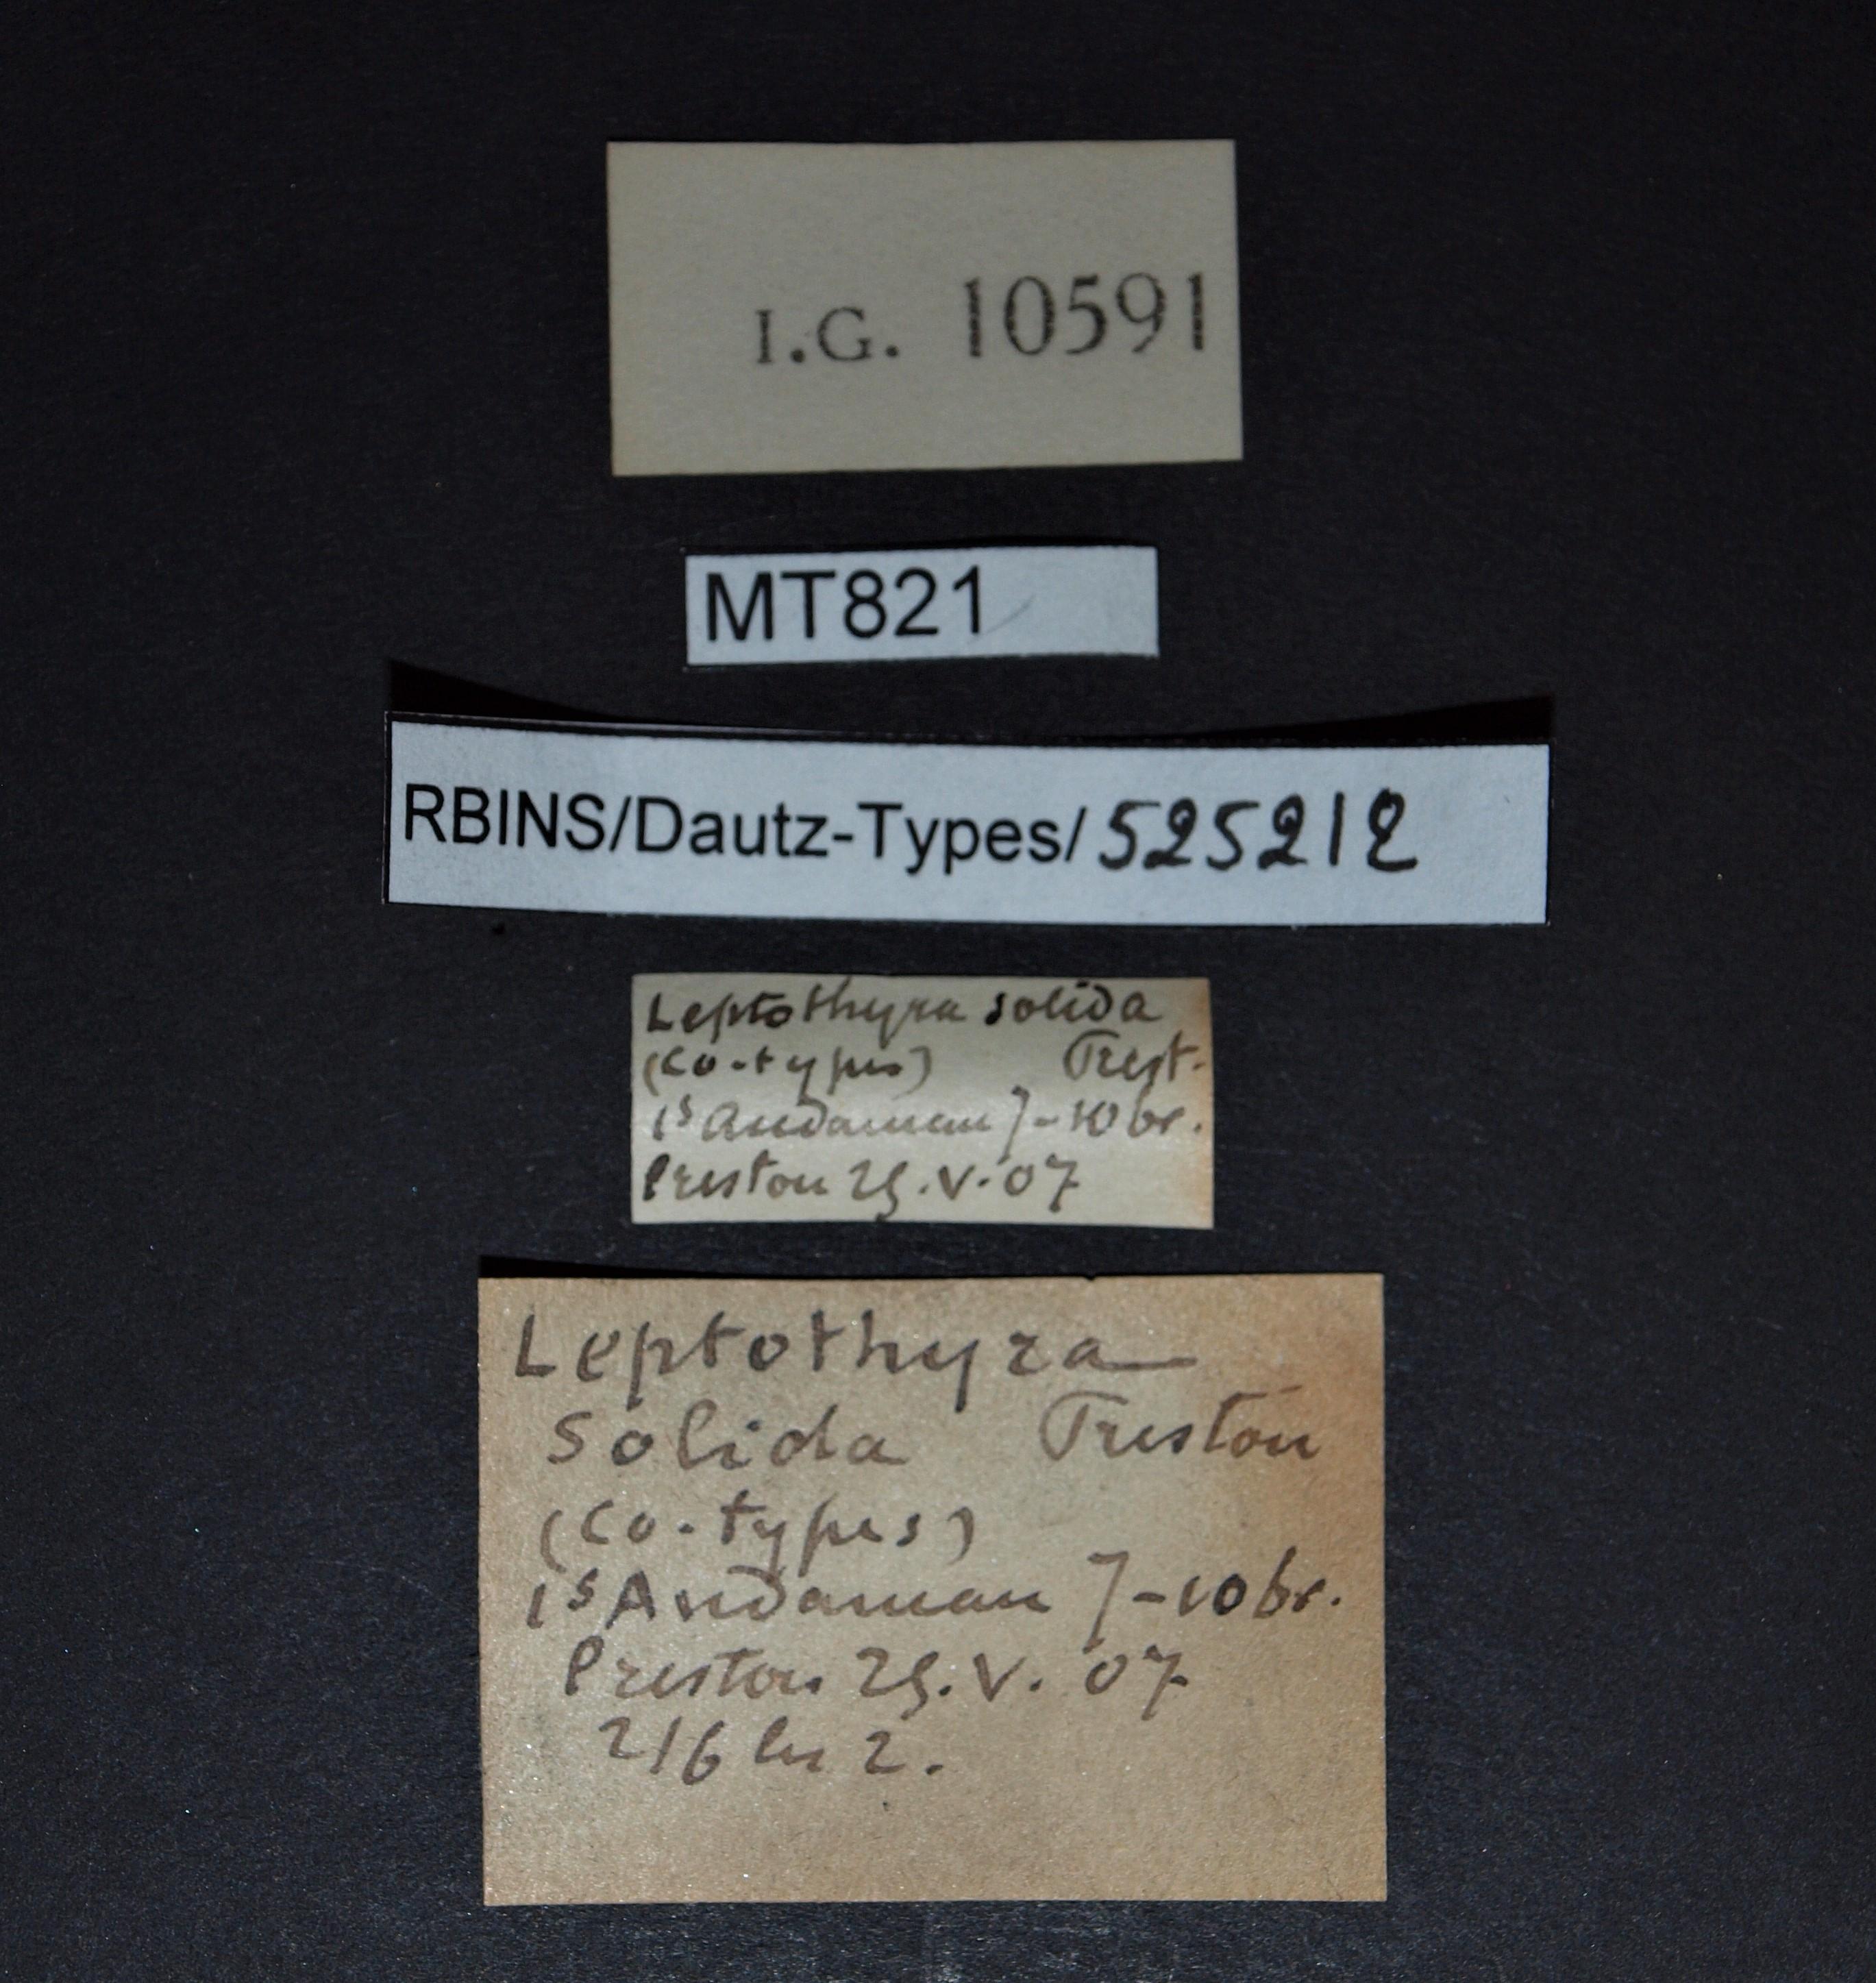 BE-RBINS-INV MT 821 Leptopoma solida pt Lb.jpg